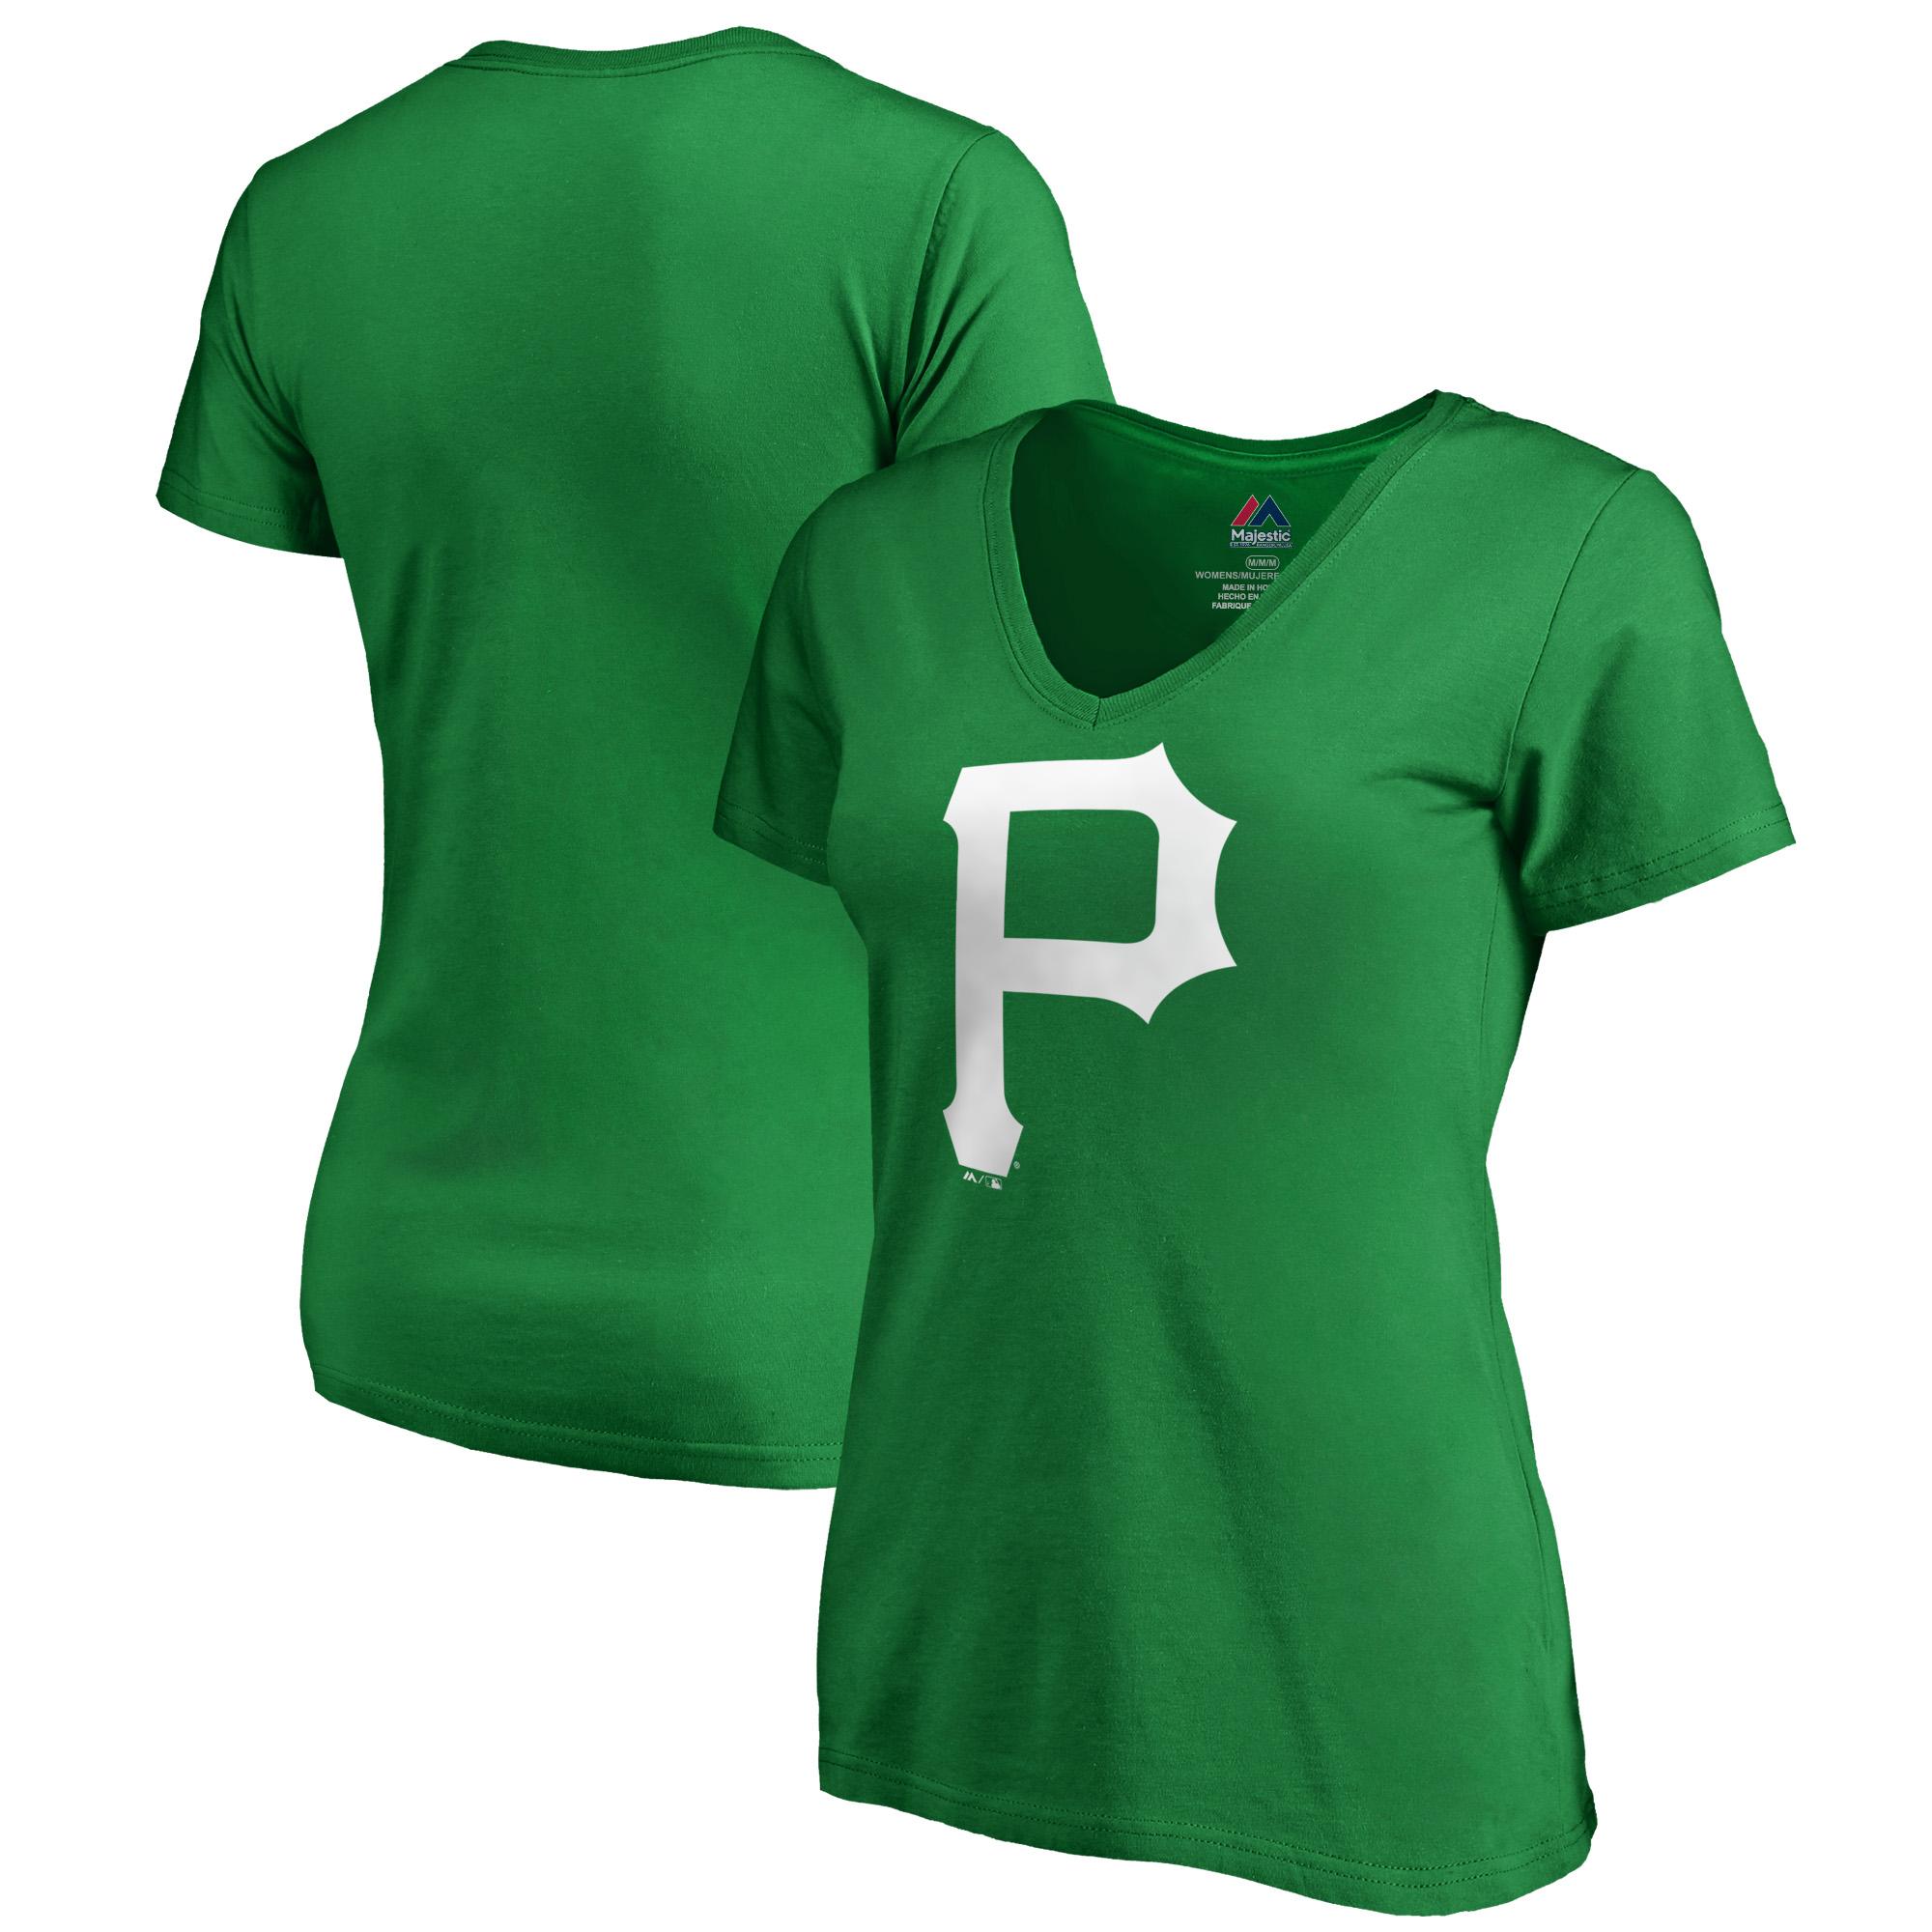 Pittsburgh Pirates Majestic Women's St. Patrick's Day White Logo V-Neck T-Shirt - Kelly Green